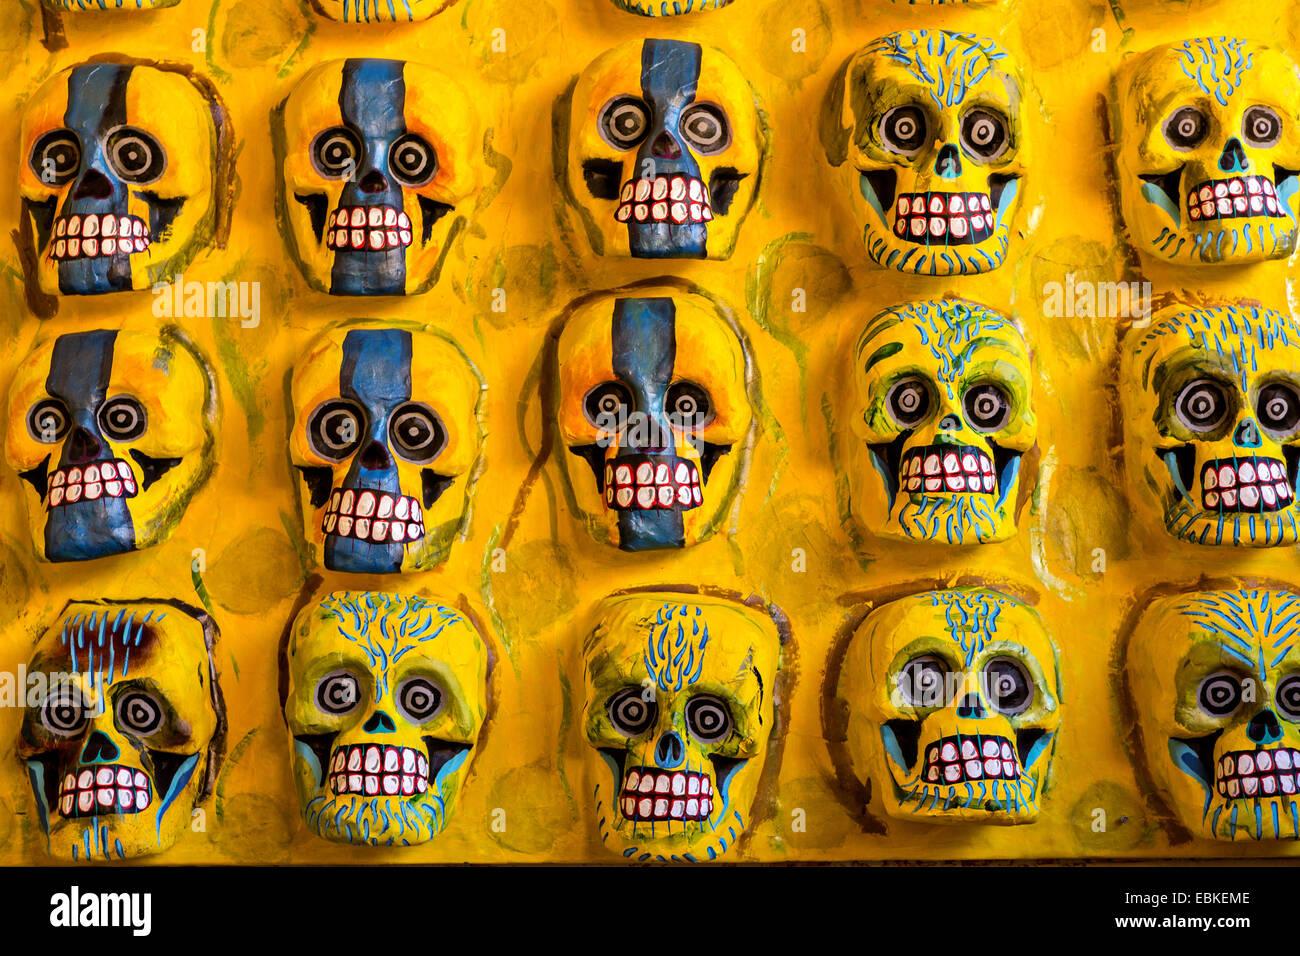 Oaxaca Mexico Day Dead Decorations Stock Photos & Oaxaca Mexico Day ...